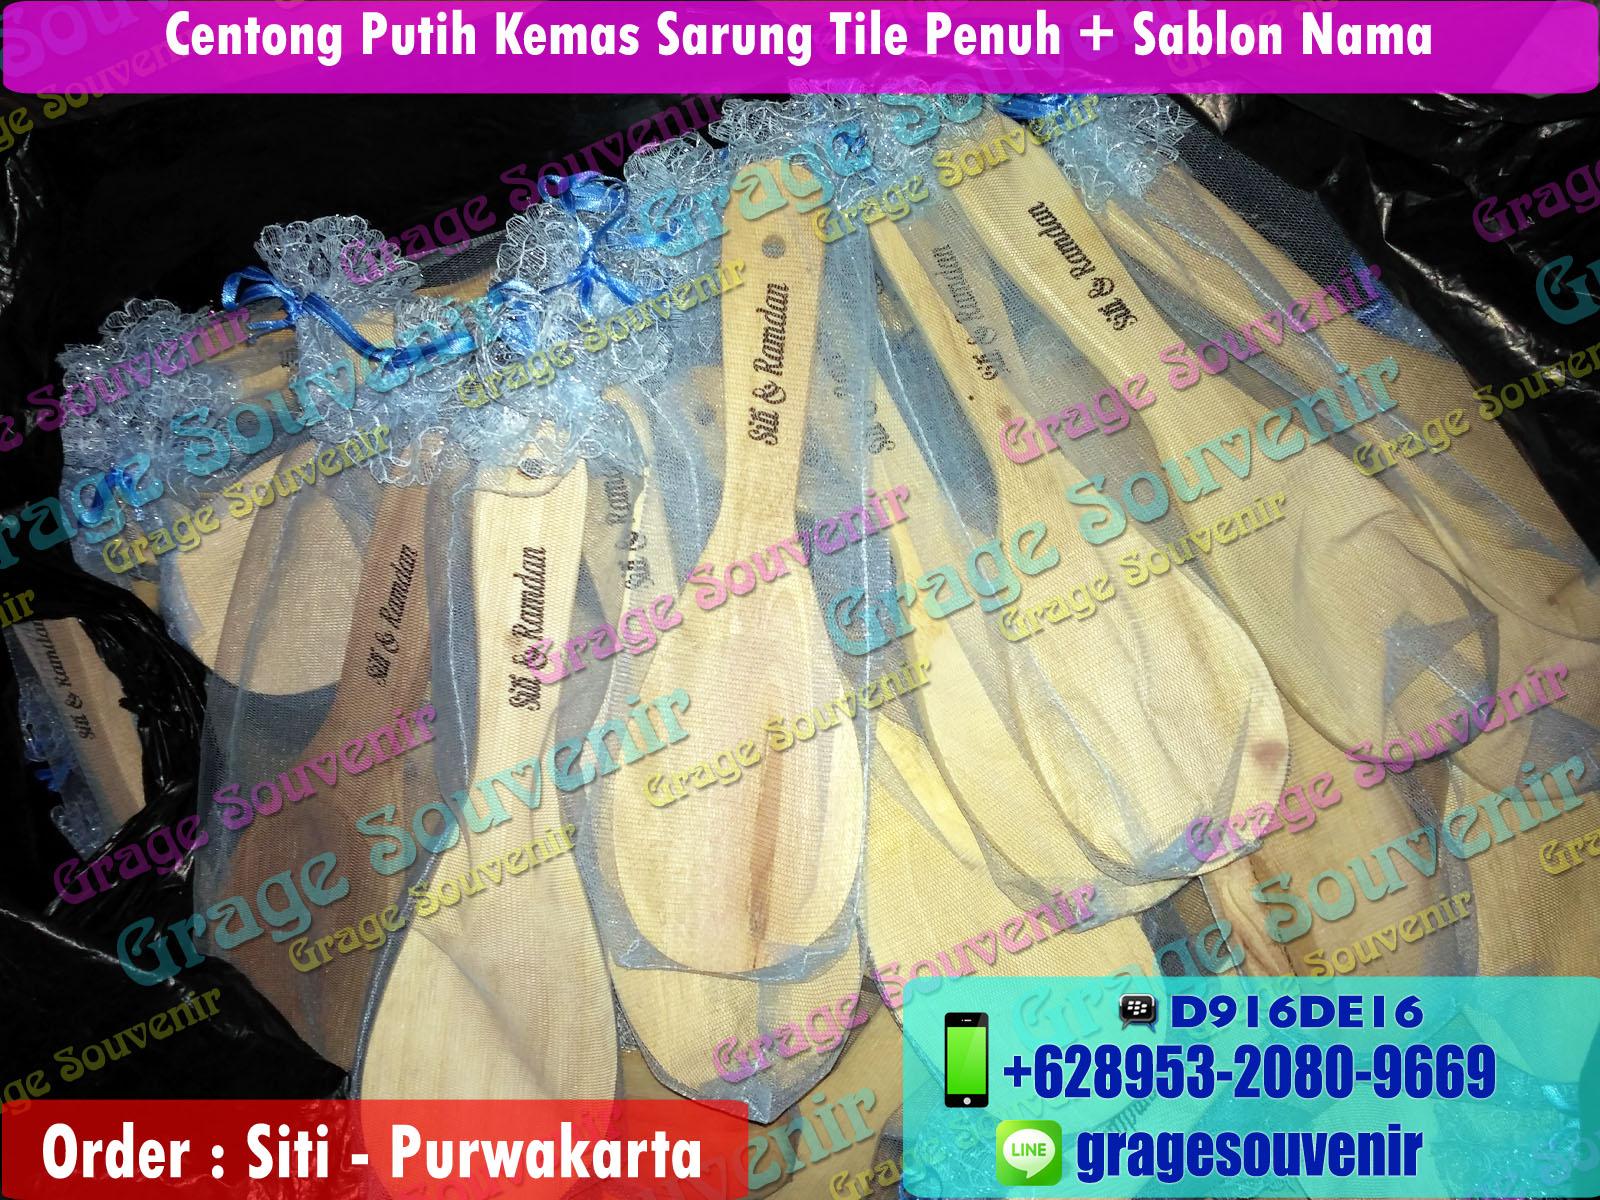 Jual Souvenir Purwakarta Murah Centong Kayu Kemas Tile